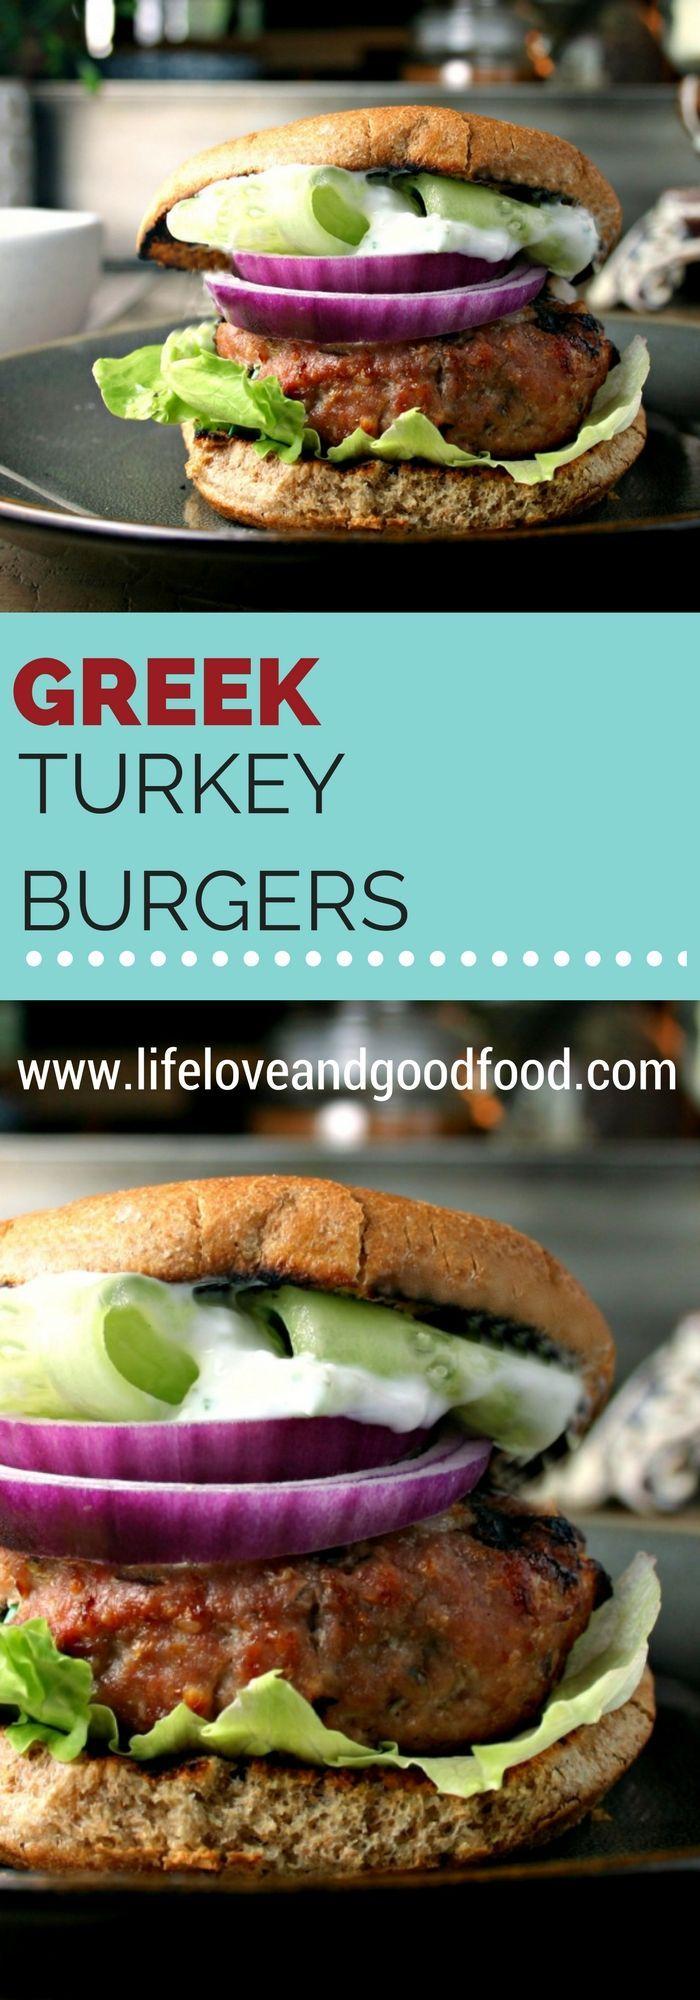 Greek Turkey Burgers | #healthy: http://lifeloveandgoodfood.com/greek-turkey-burgers